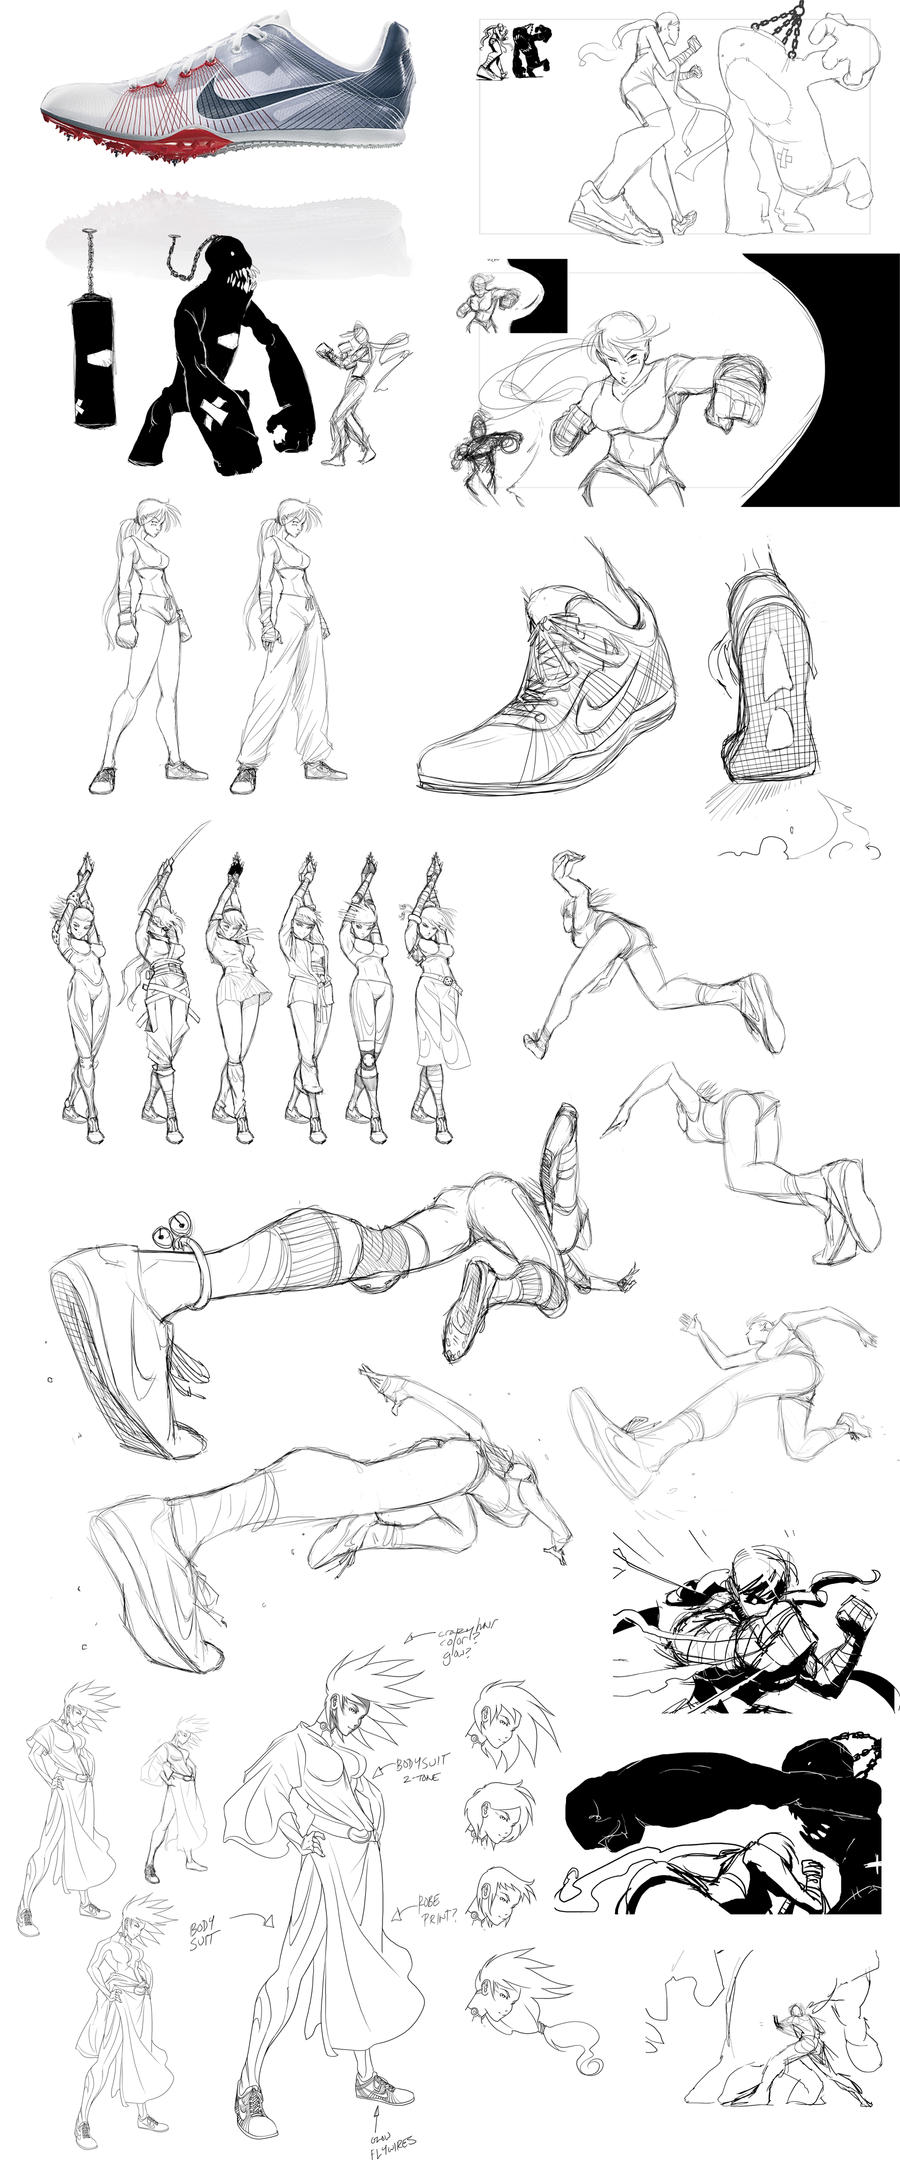 OLD WORK - Nike Mishmash by Inkthinker